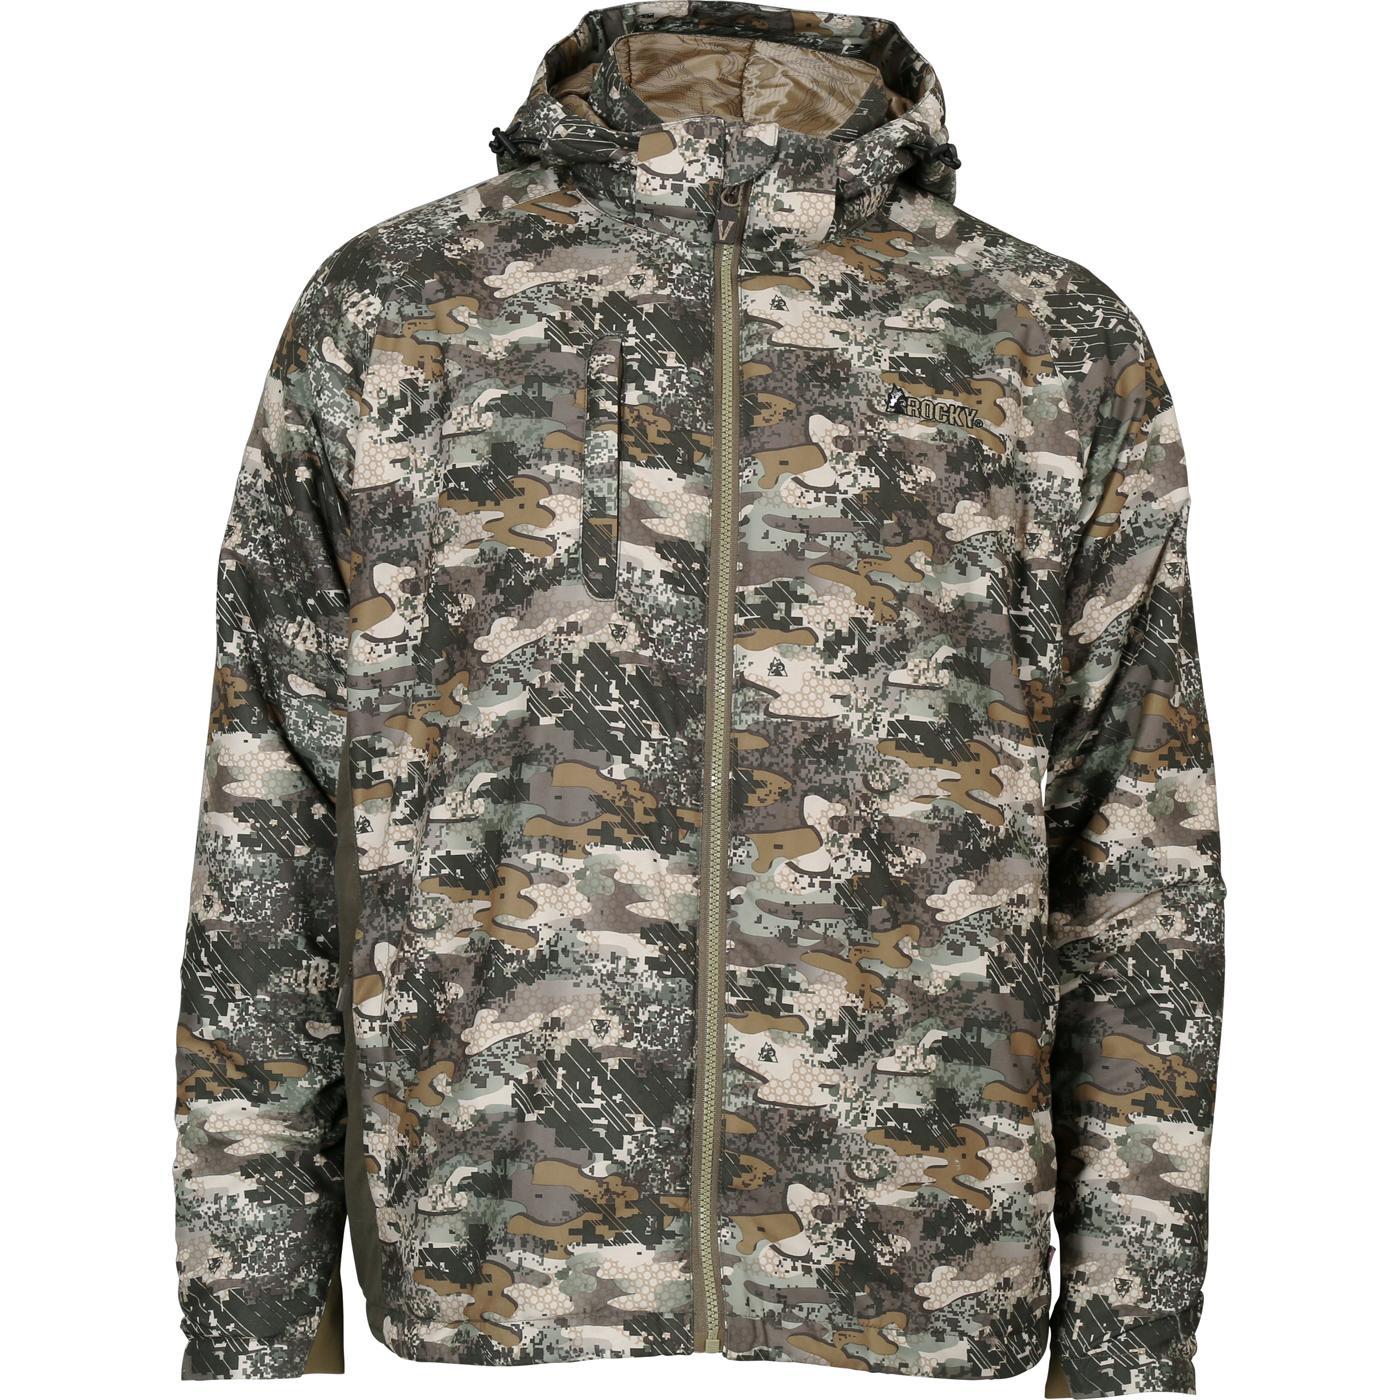 3284fdf1b5158 Rocky Camo Insulated Packable Jacket, Rocky Venator Camo, large